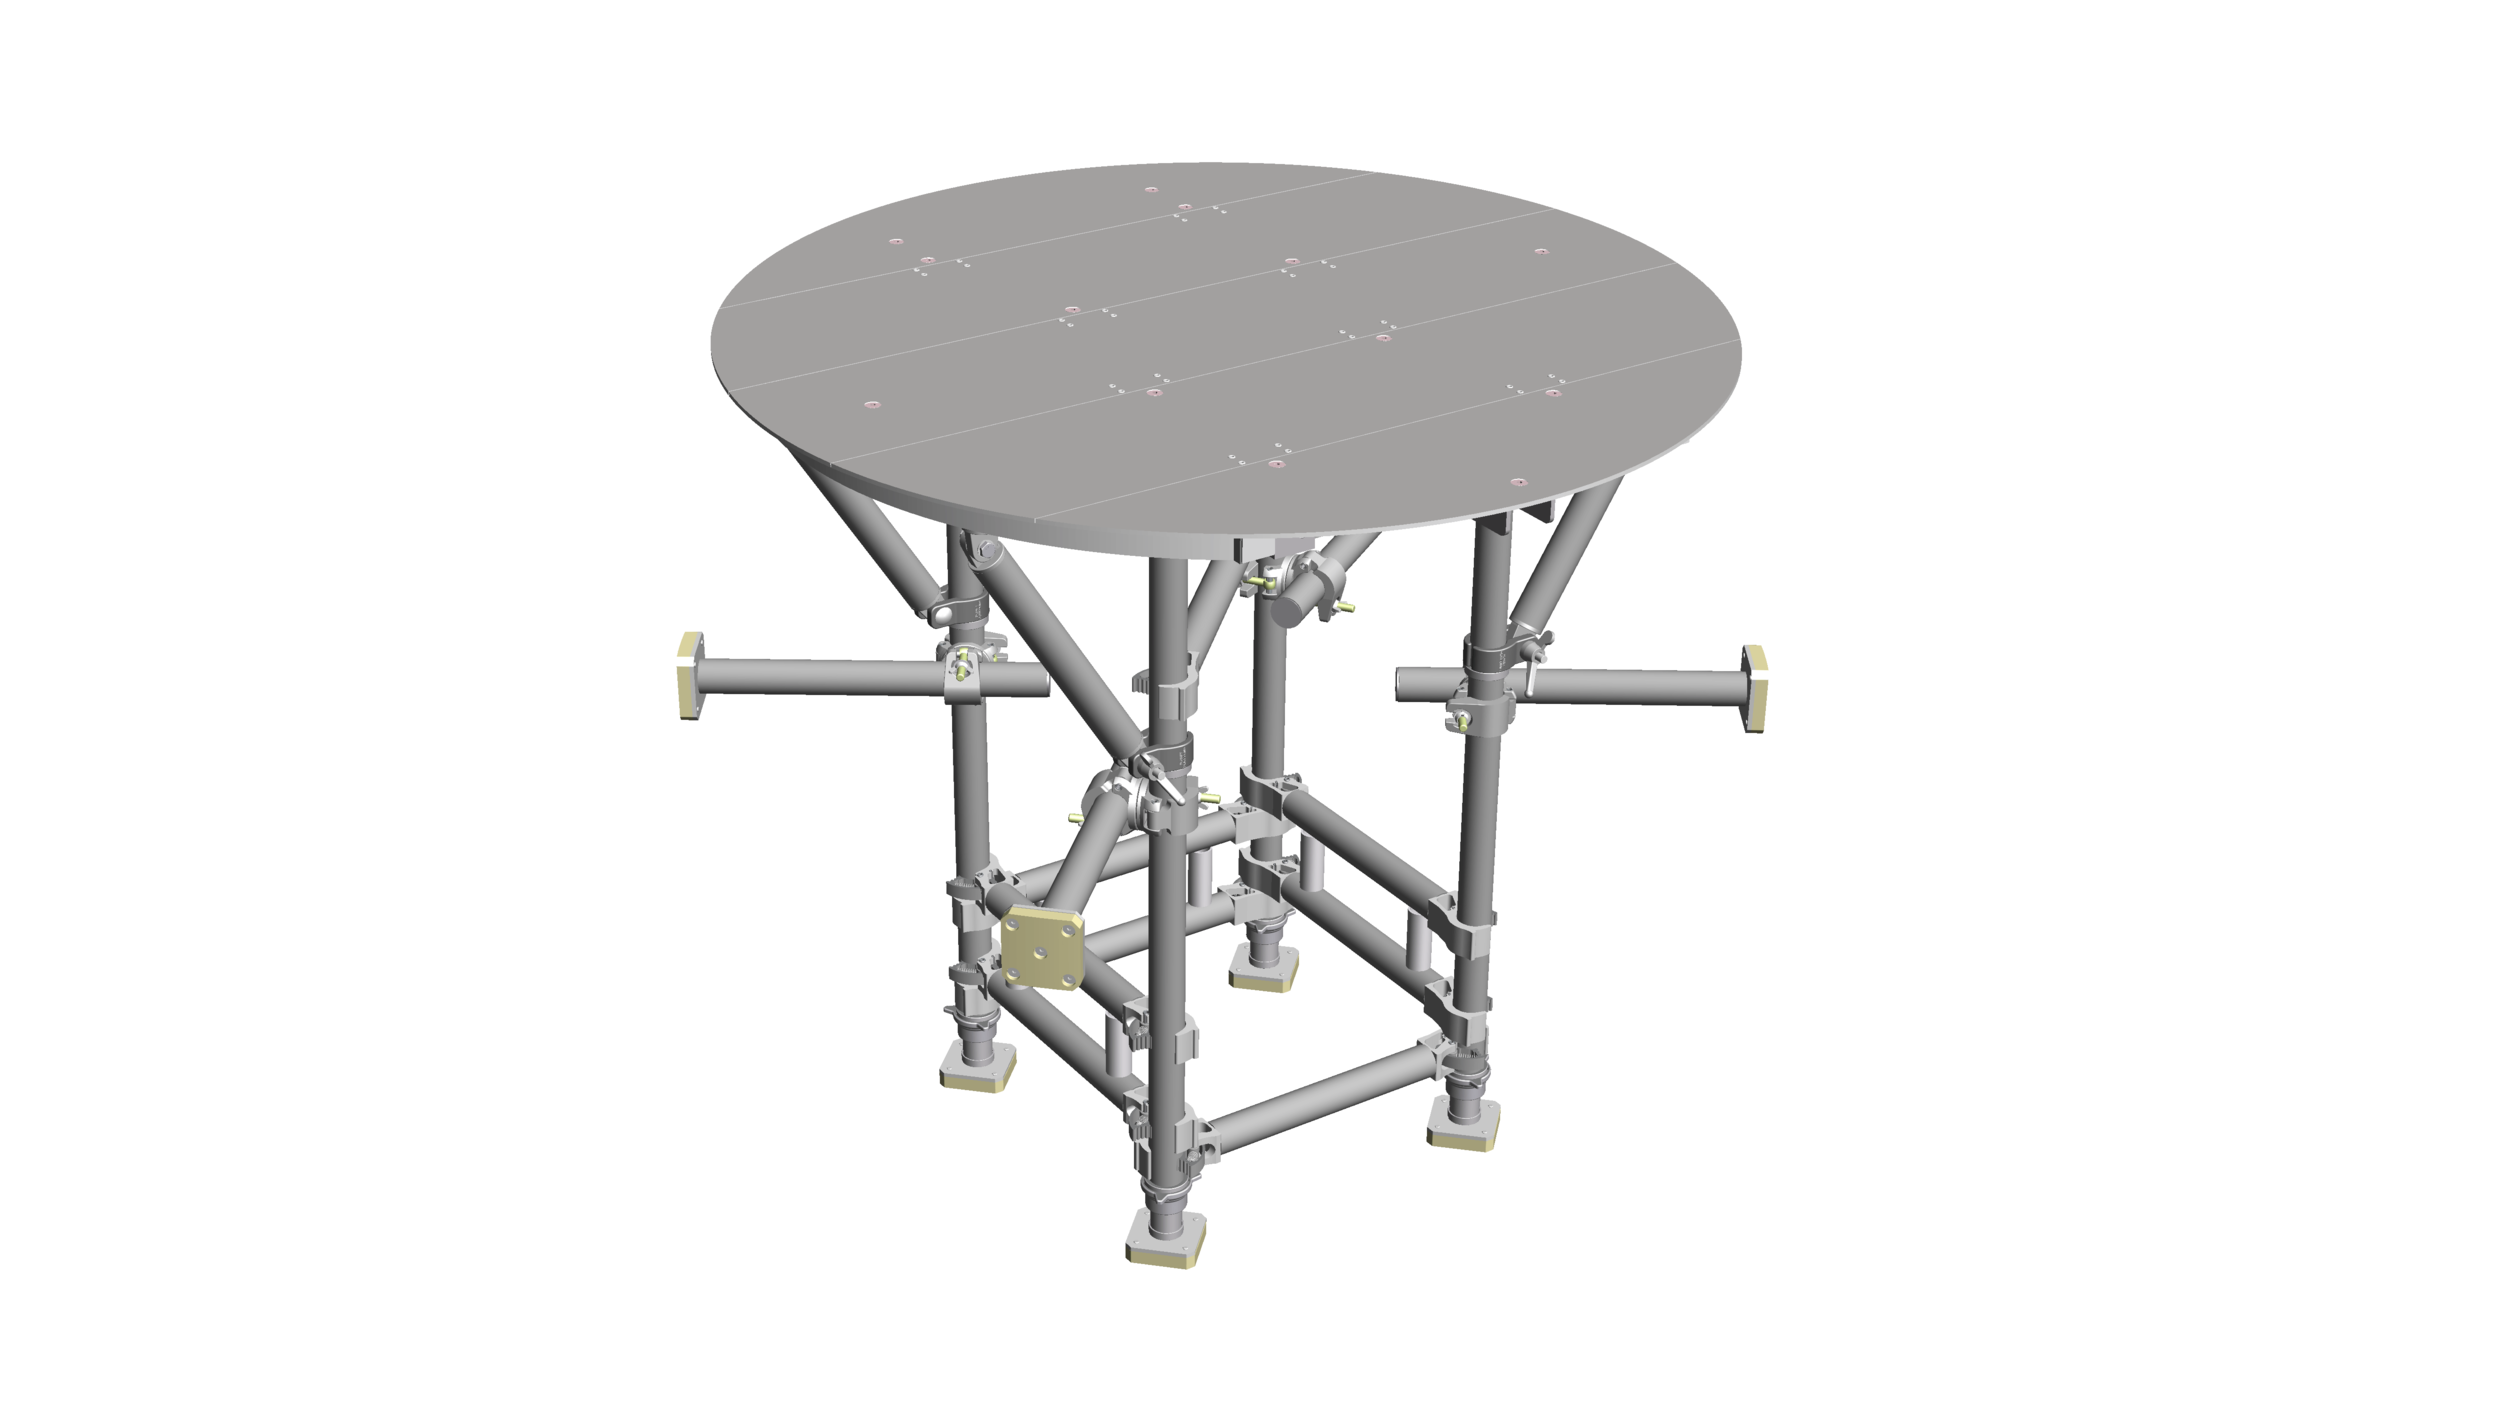 1. Vessel access platform